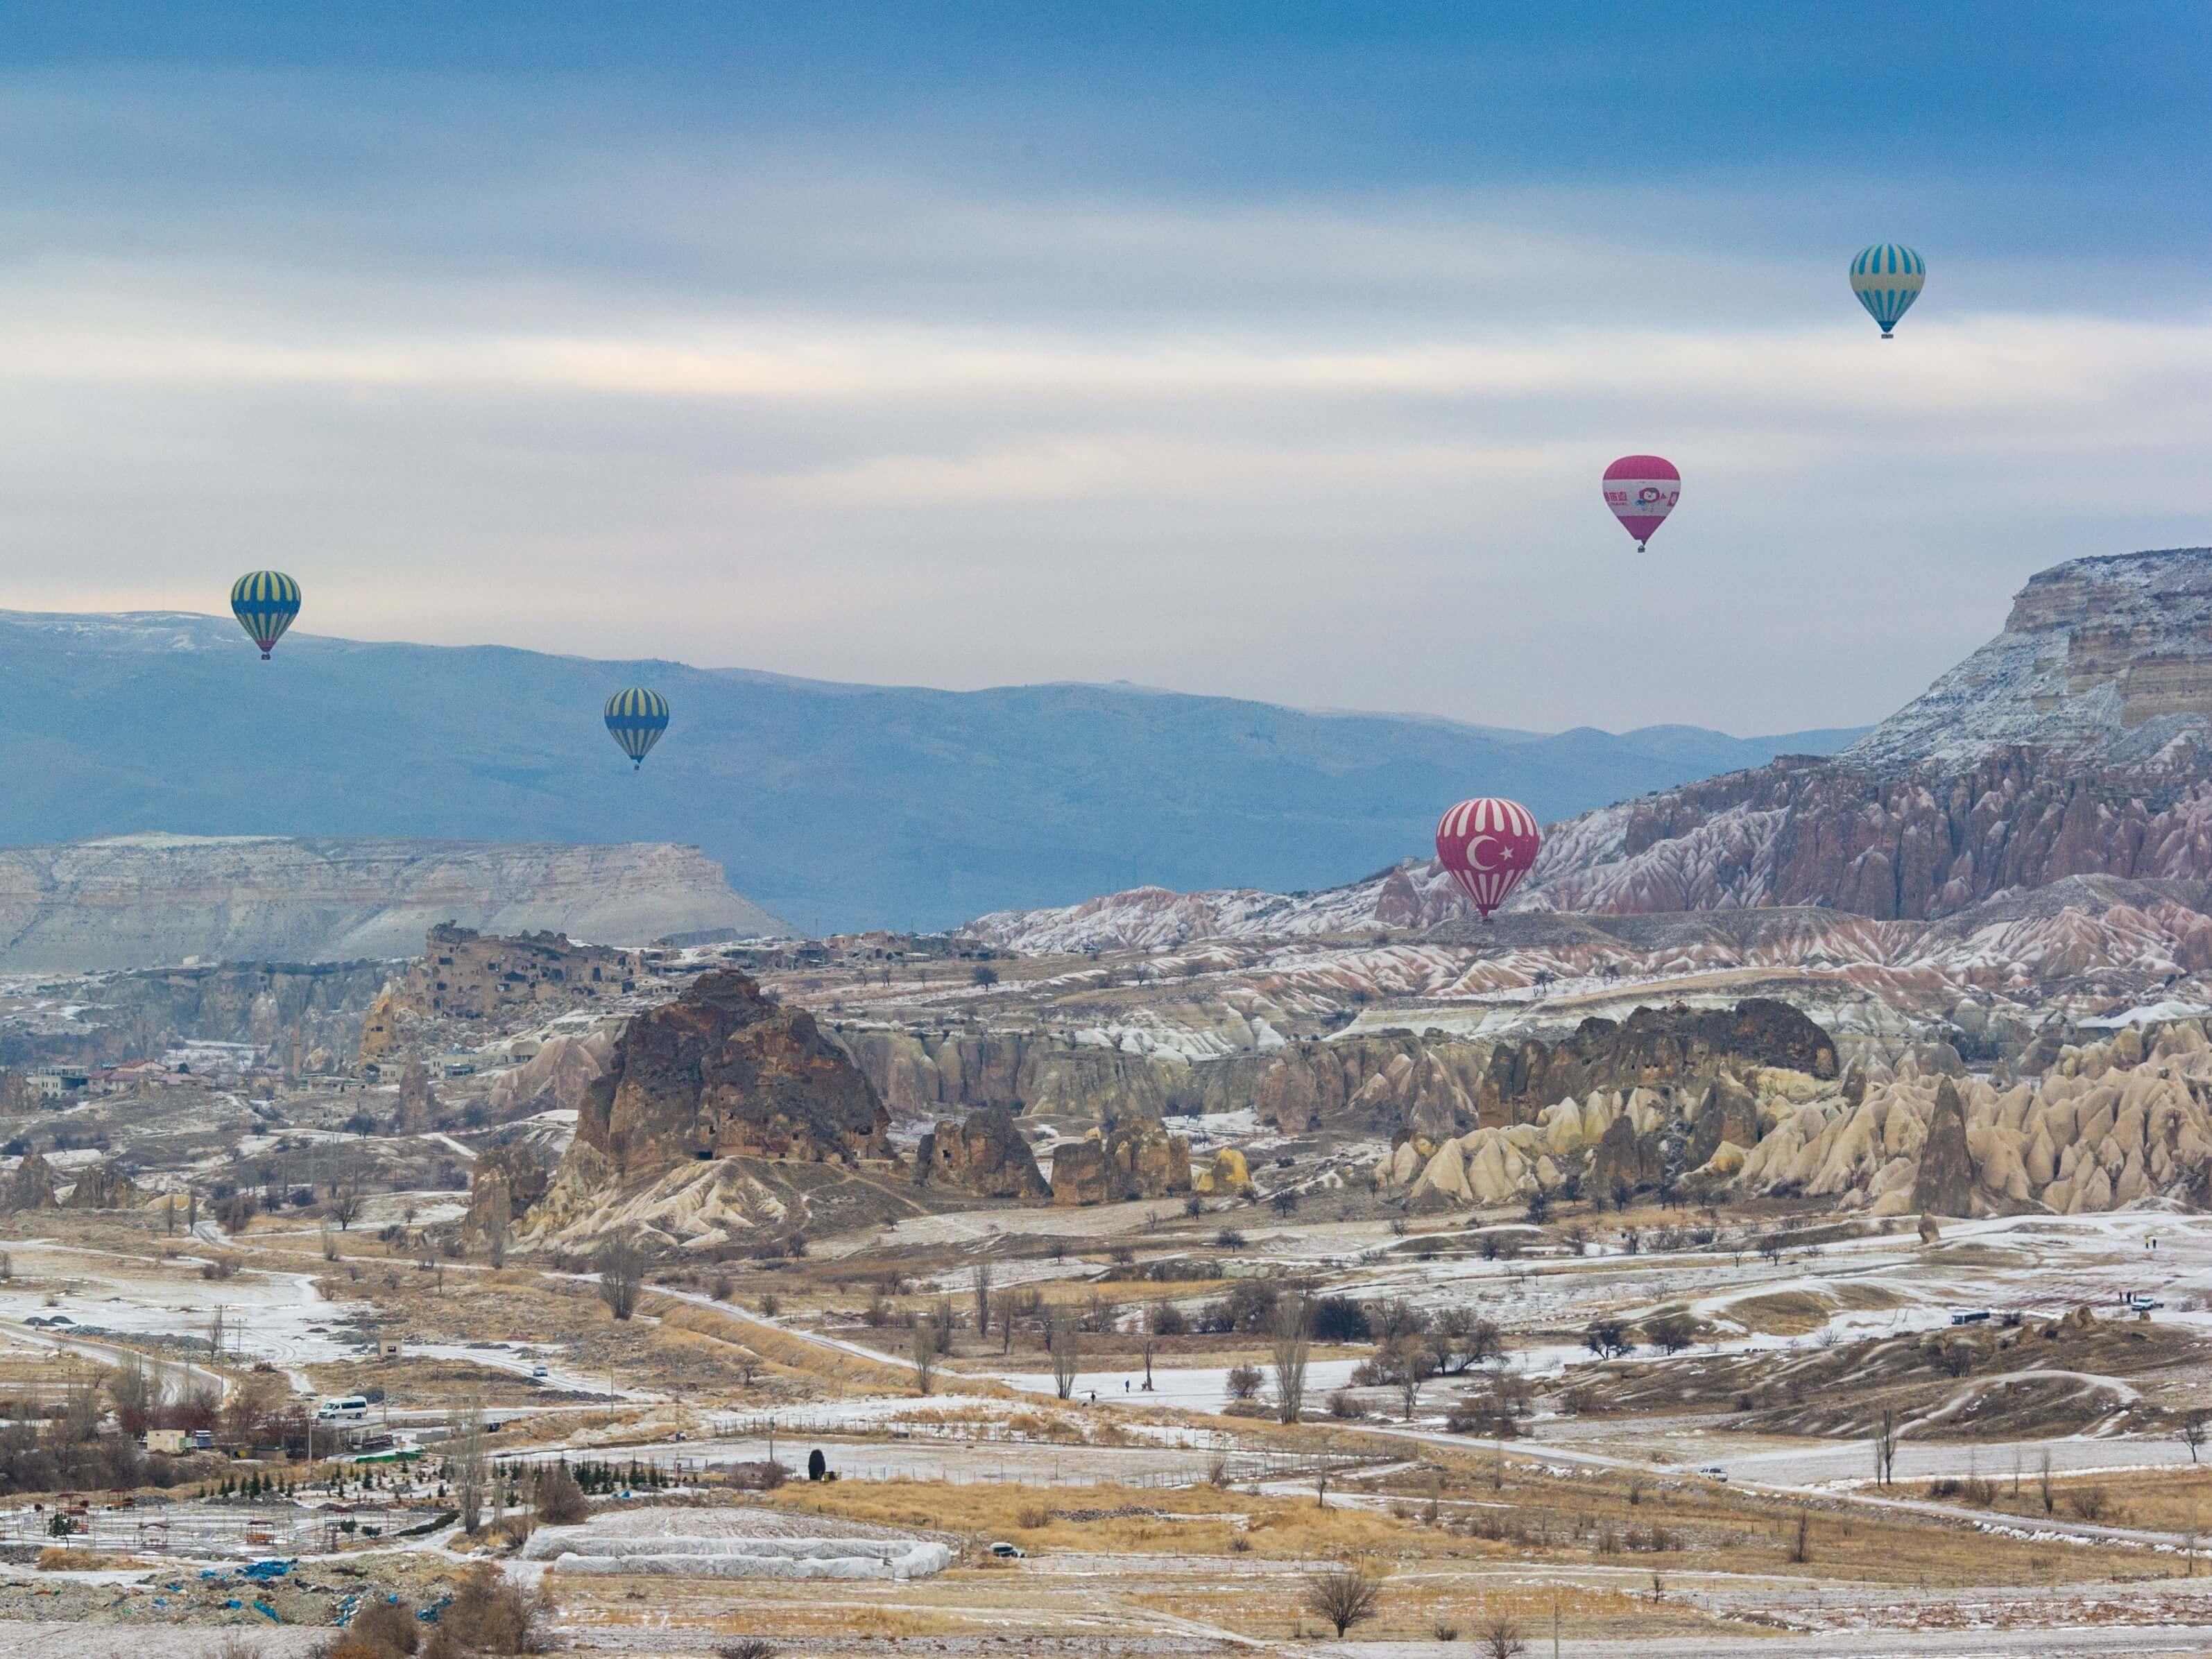 Alipay Balloons in Turkish Tourism Market